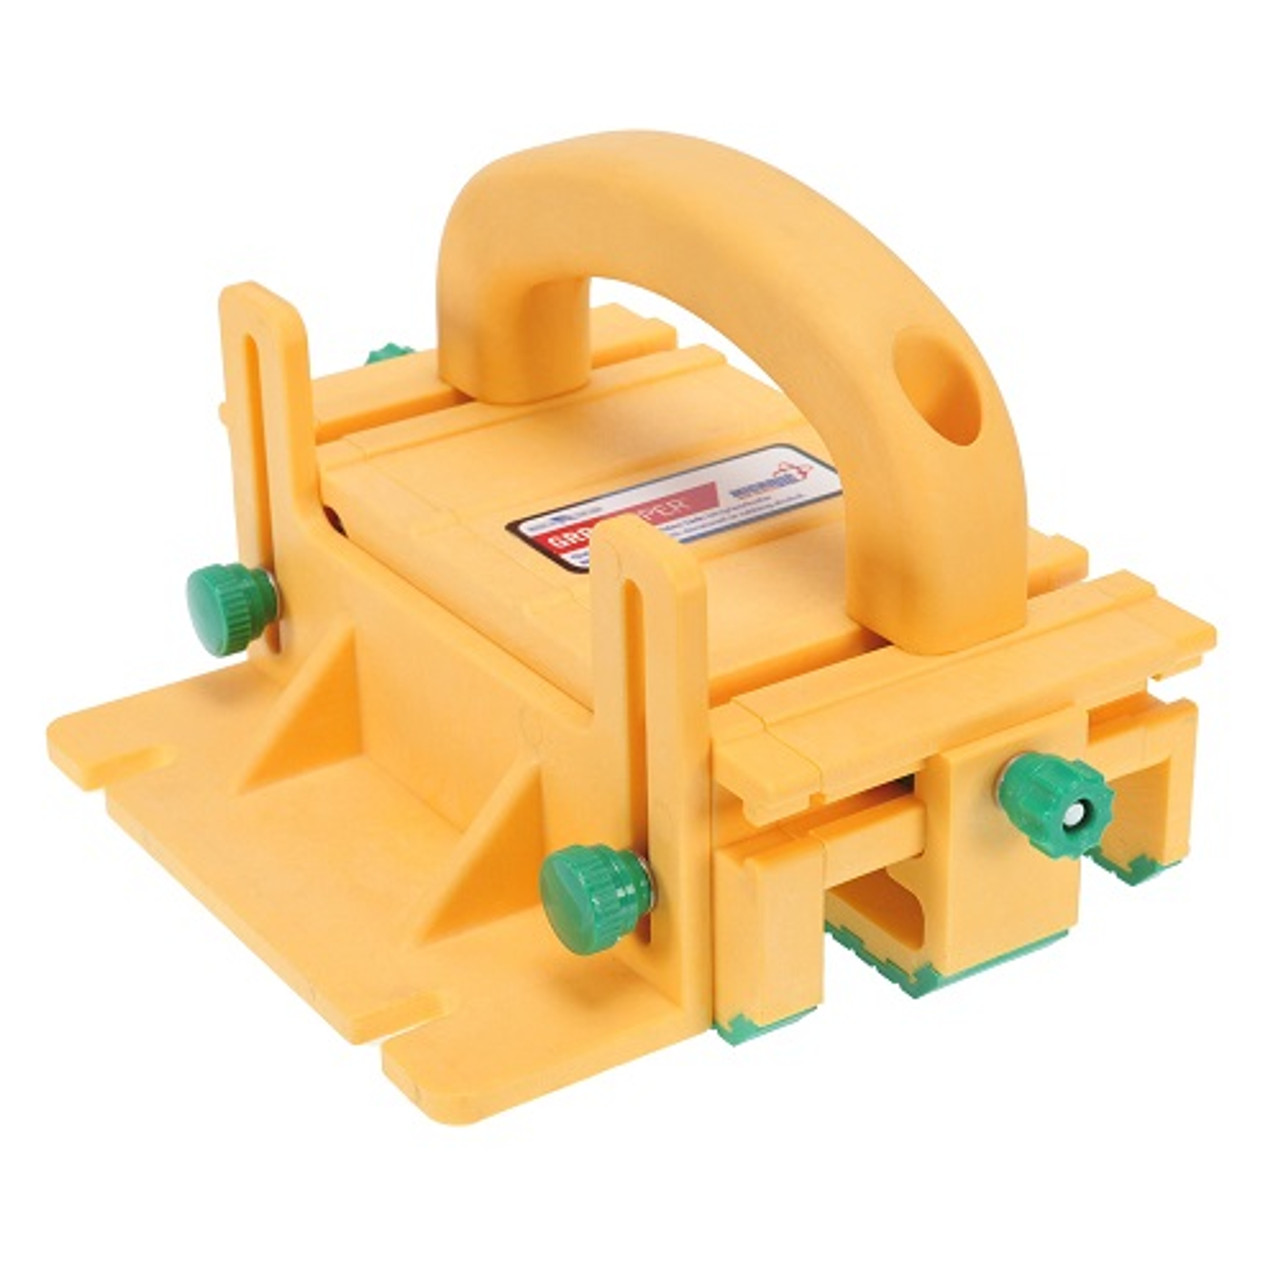 2-Pack Micro Jig GR-100 GRR-Ripper Basic Precise Yellow 3D PushBlock System